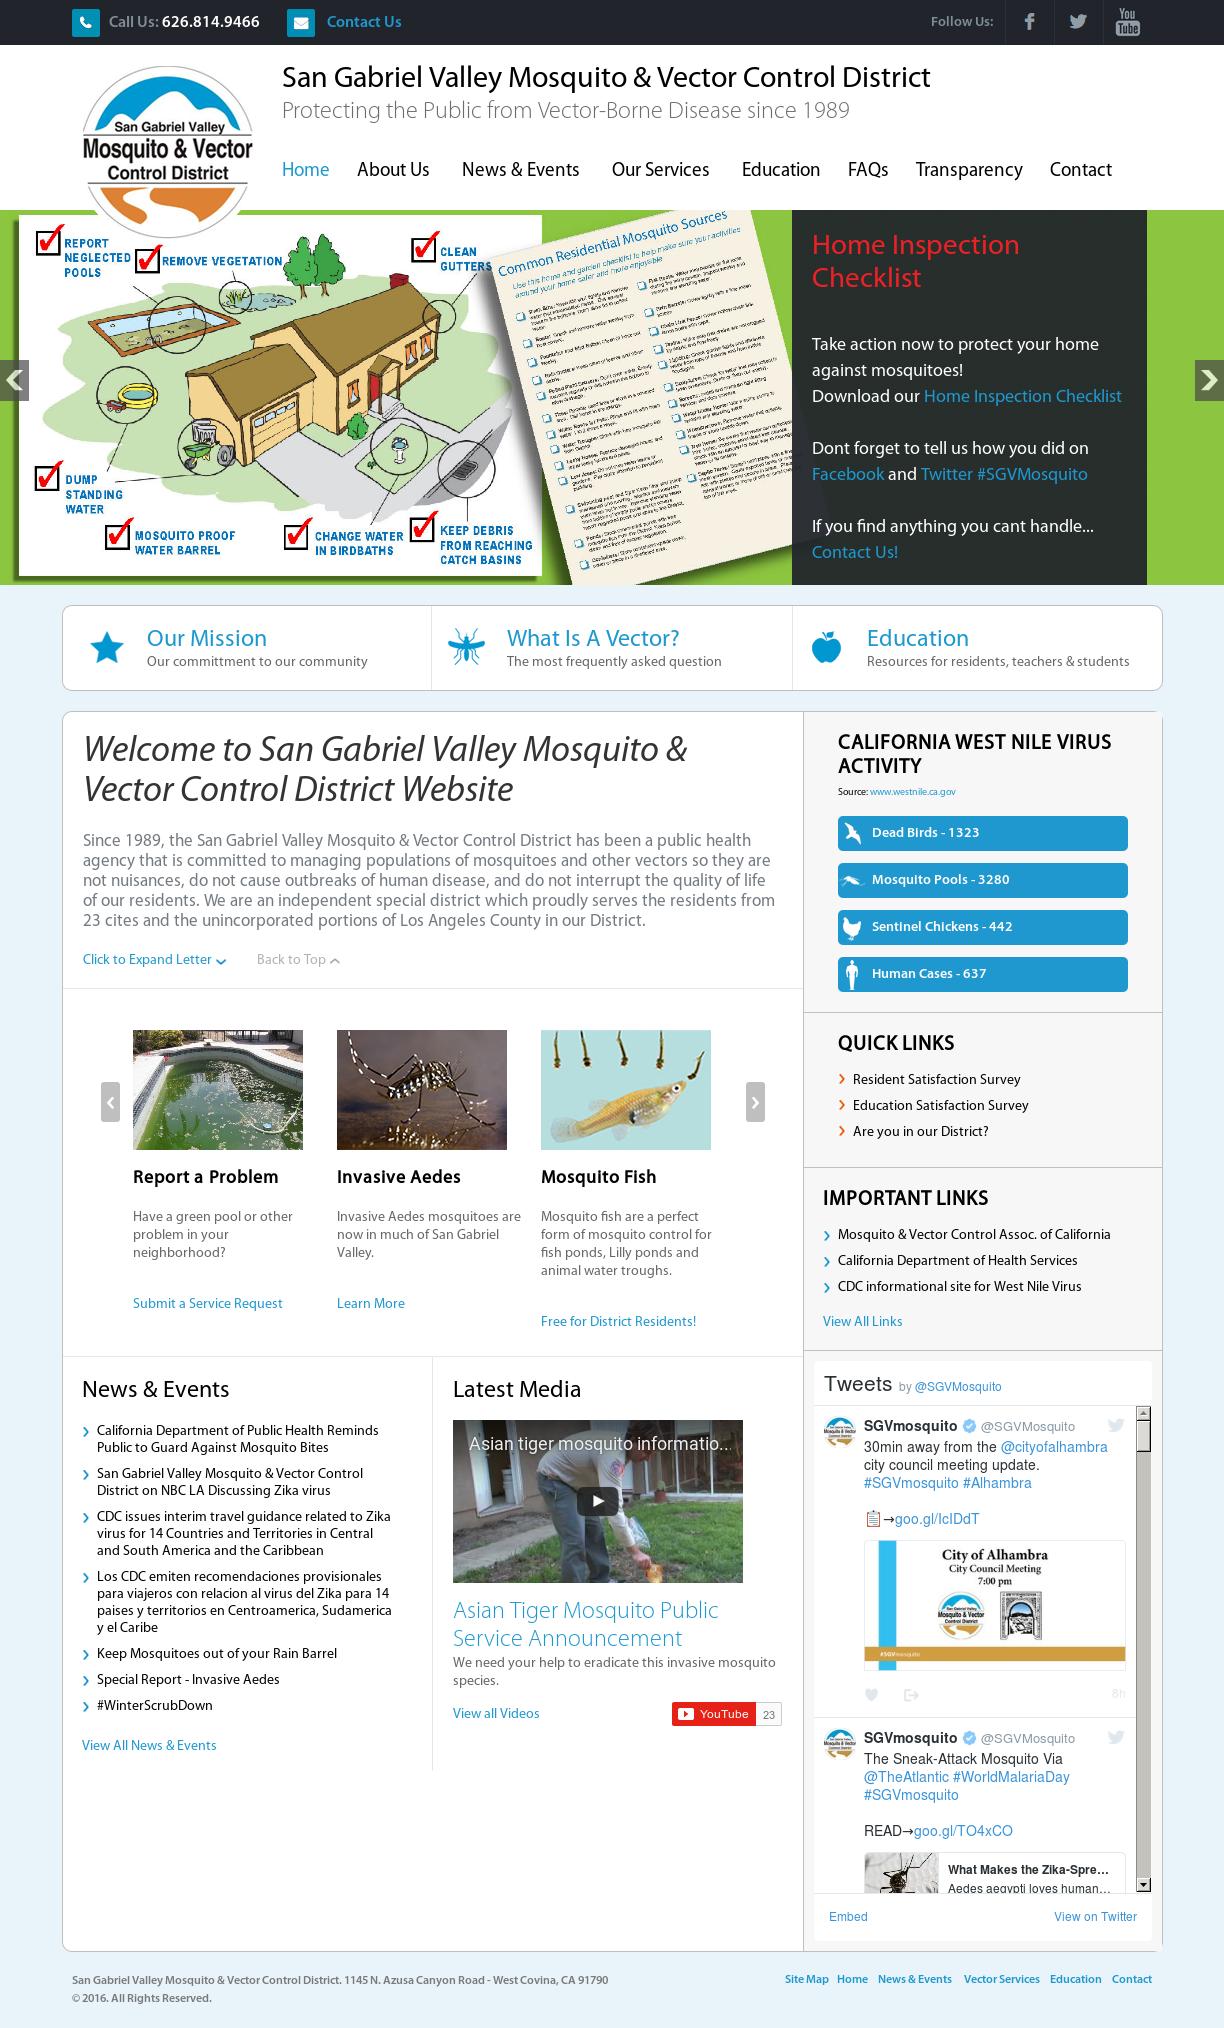 San Gabriel Valley Mosquito Competitors, Revenue and